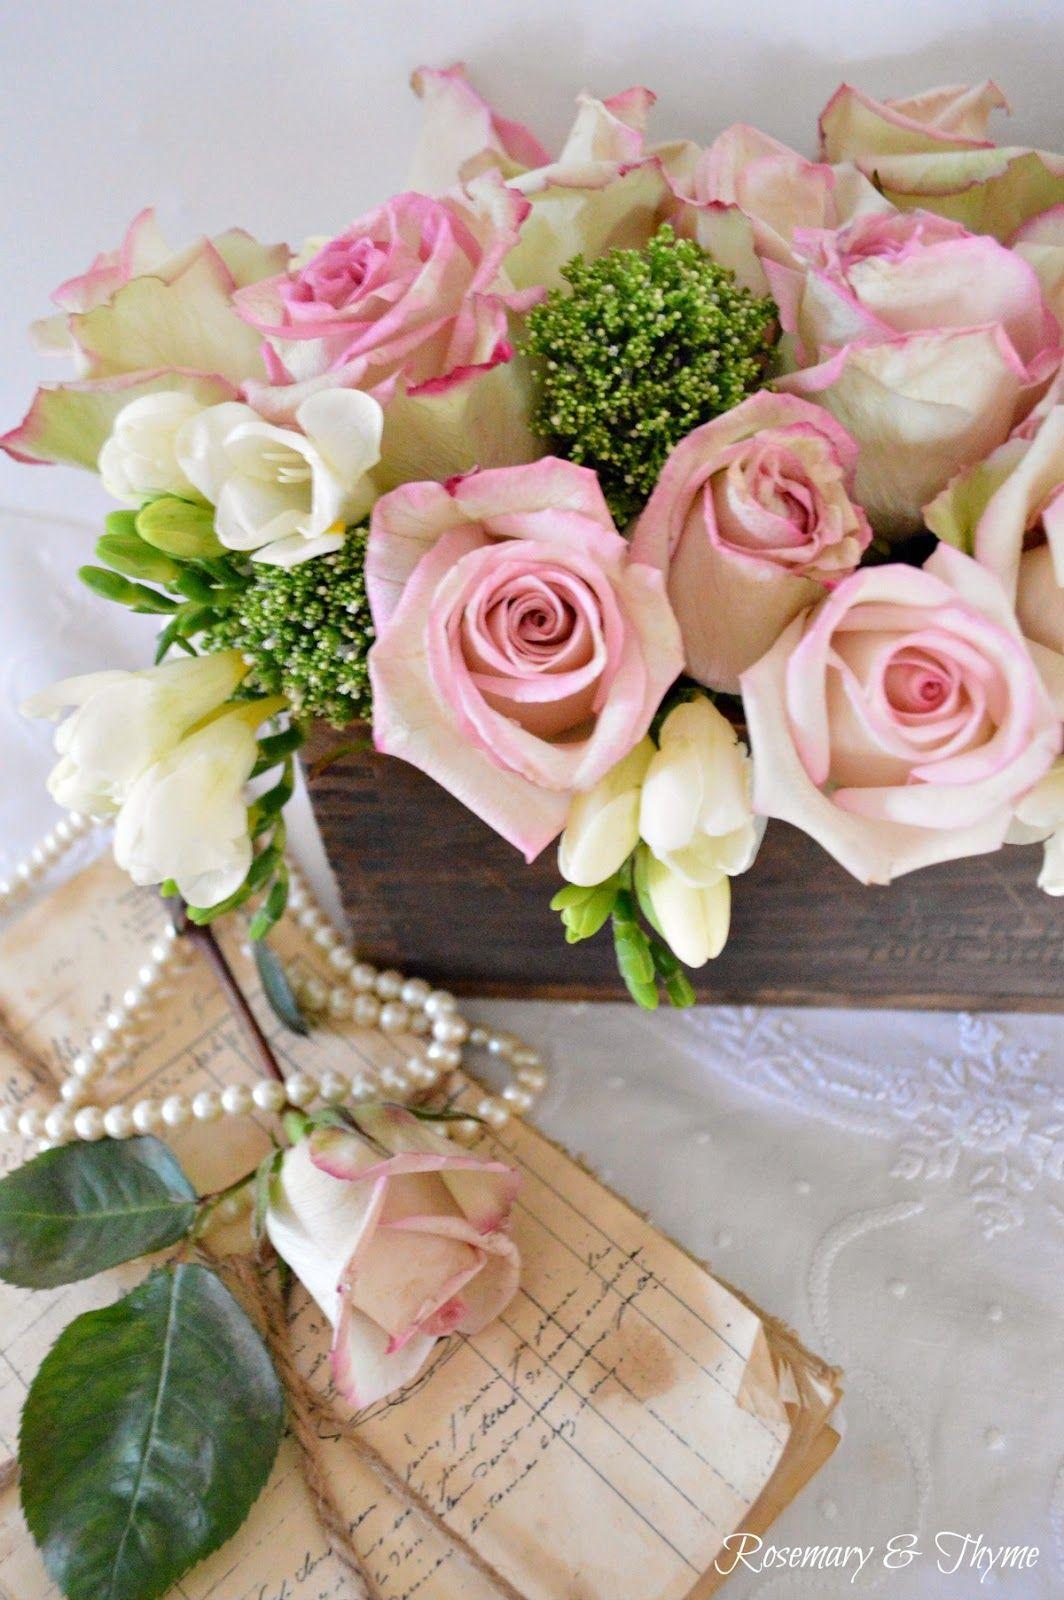 Wood Box Rustic Floral Arrangement Tutorial Interior Decorating